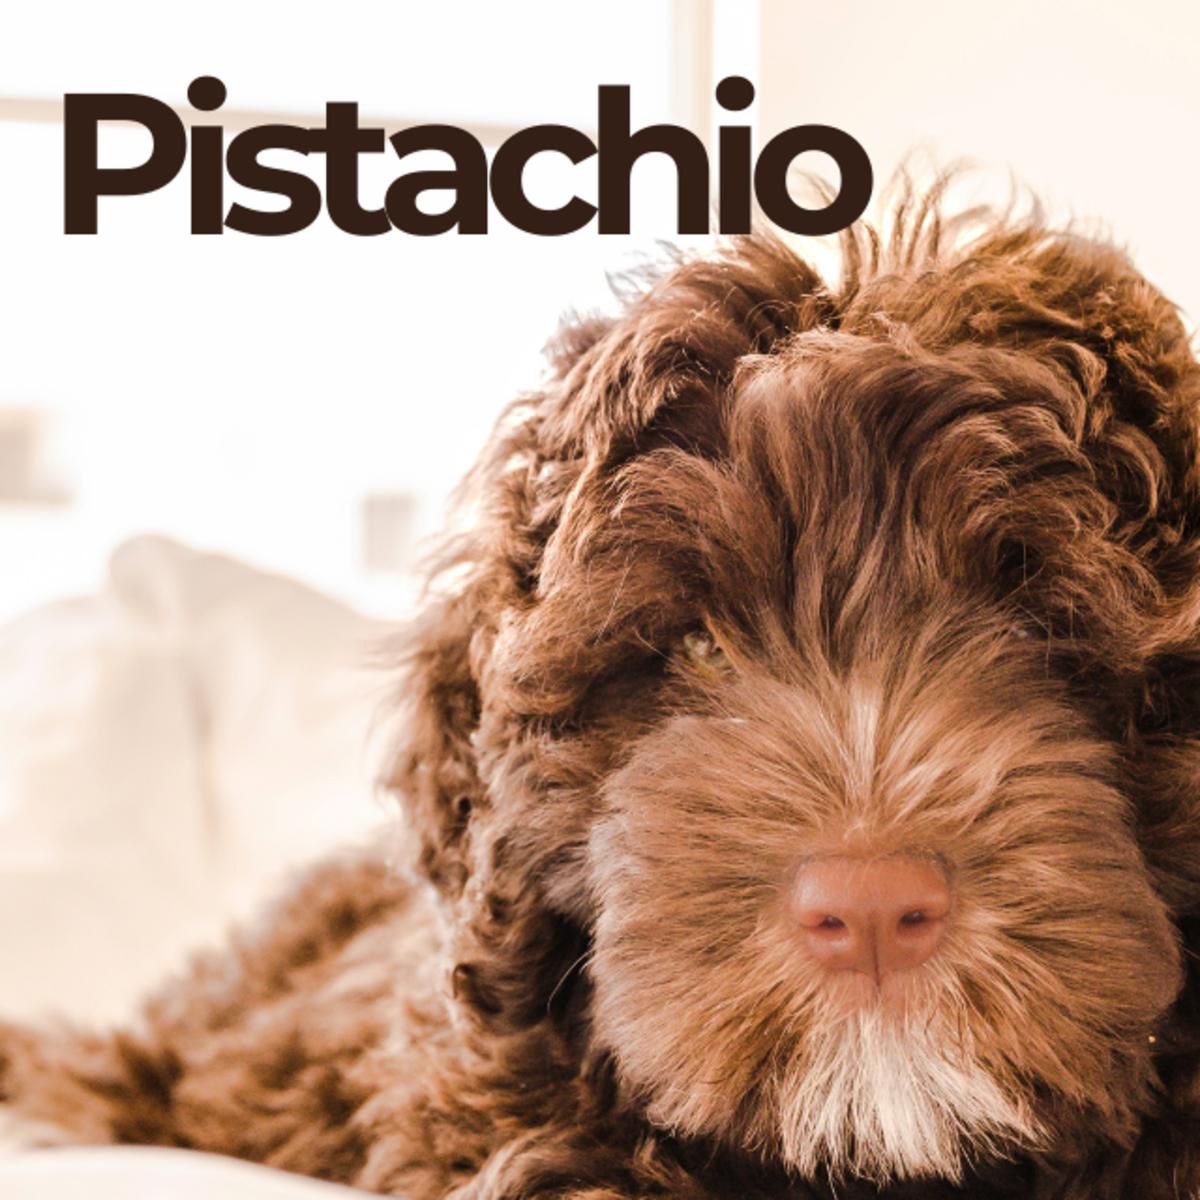 Puppy named Pistachio